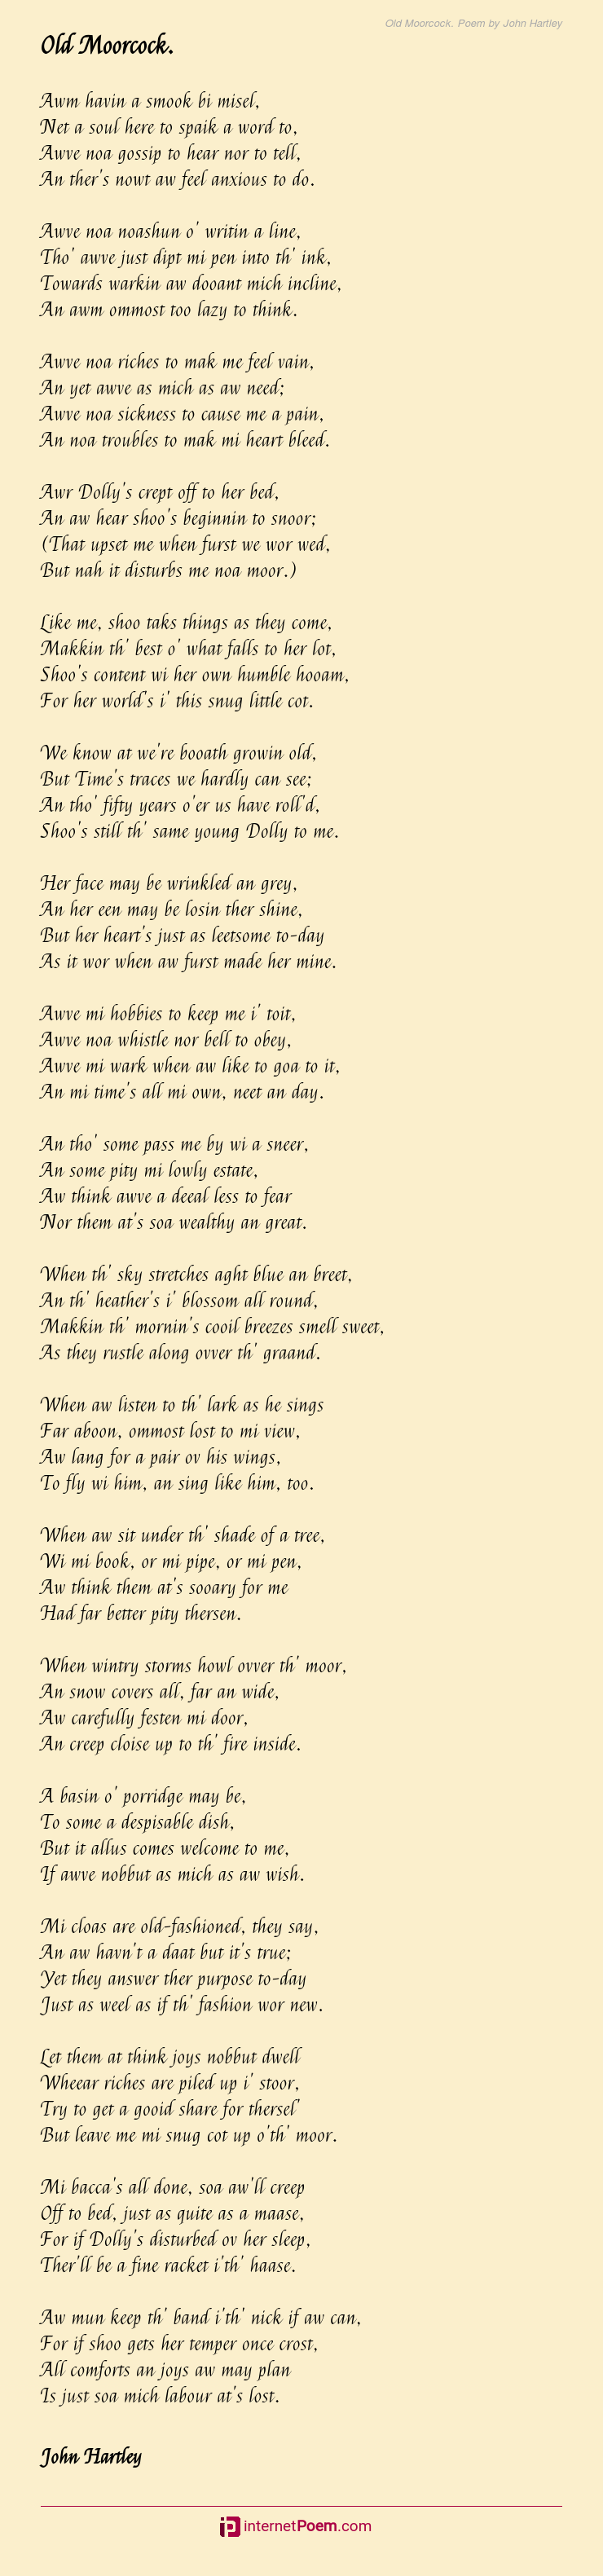 Old Moorcock Poem By John Hartley